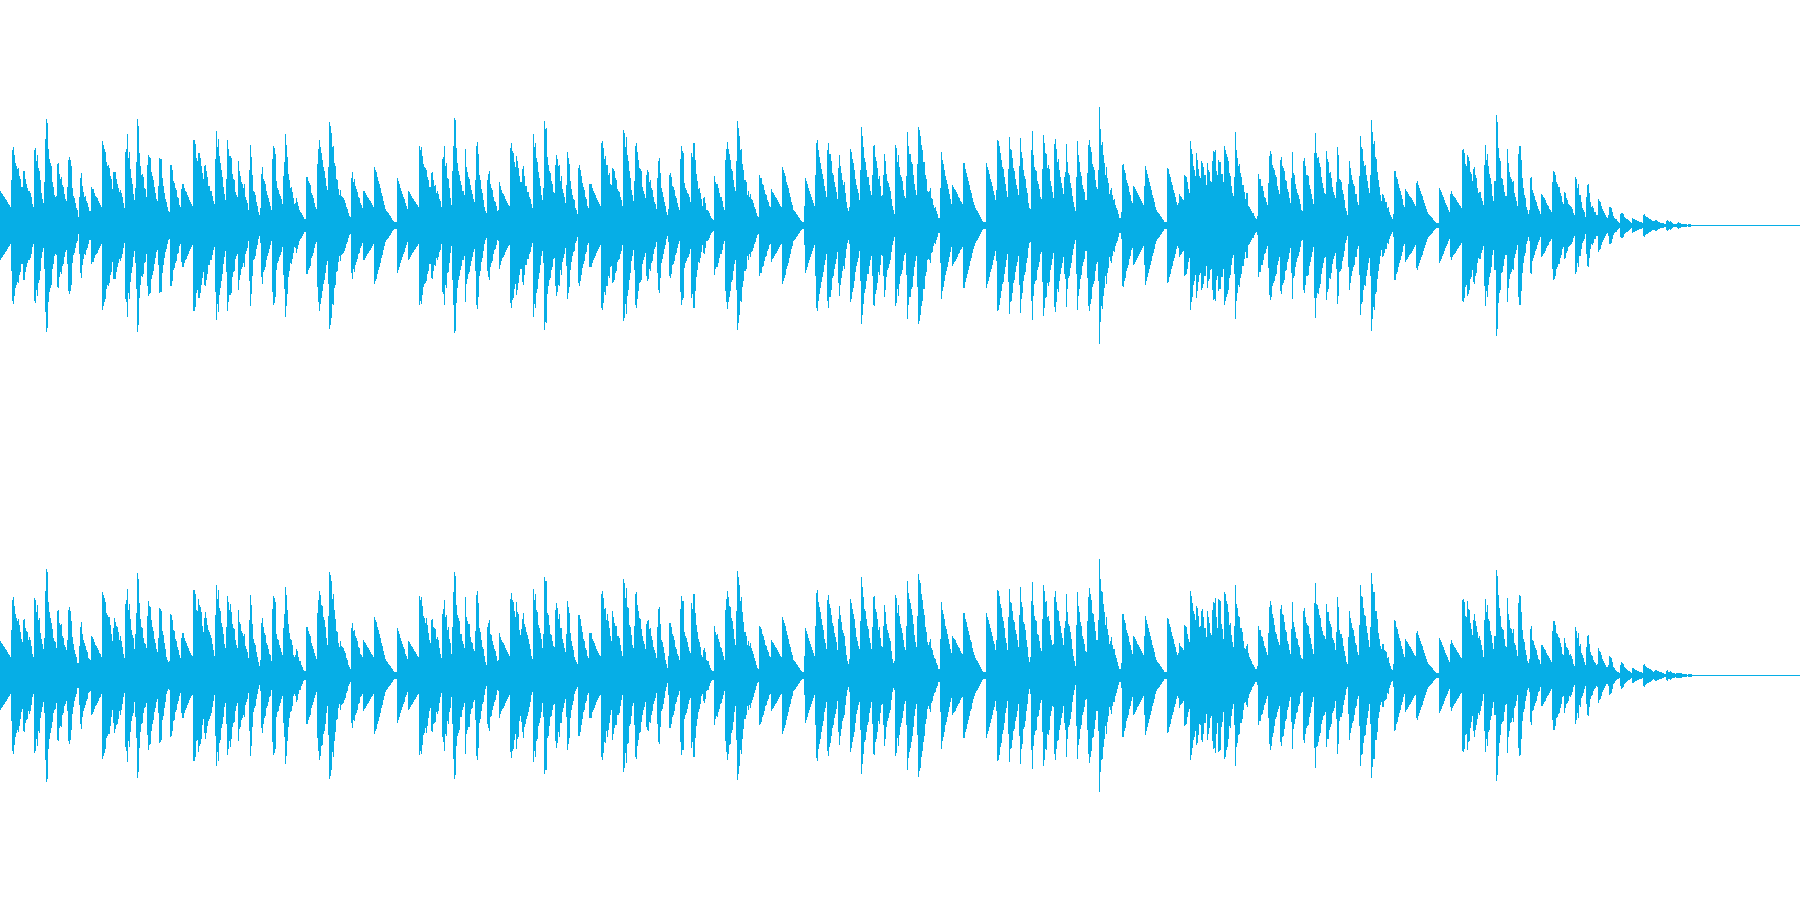 8bitクラシック-グノシエンヌ-の再生済みの波形